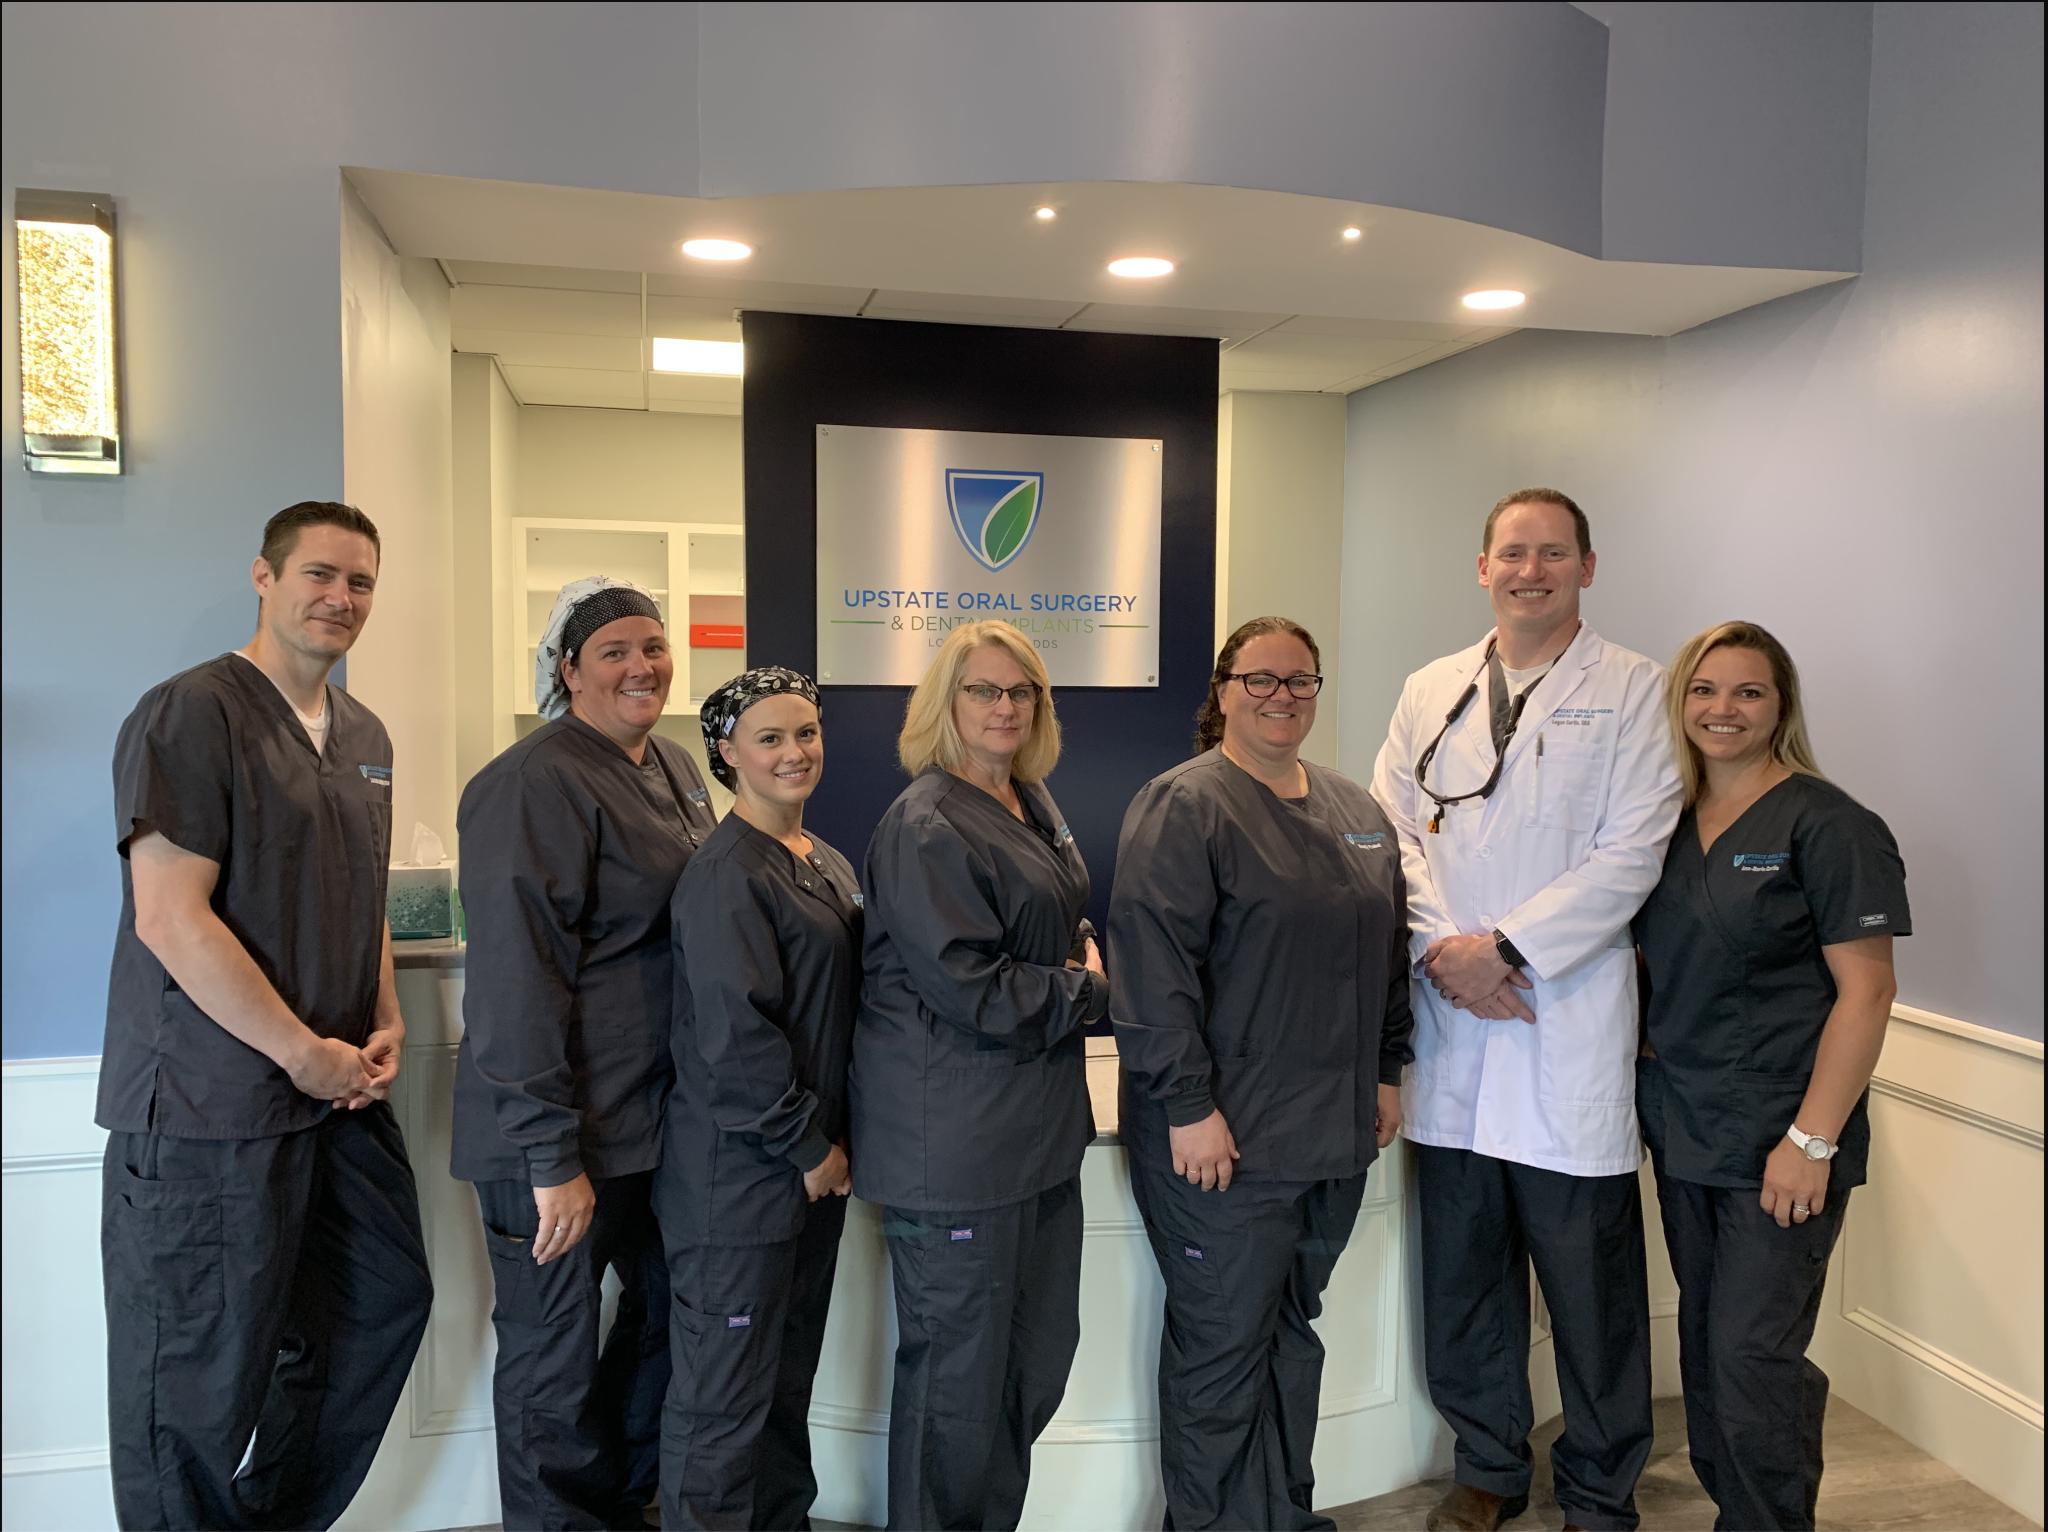 Upstate Oral Surgery & Dental Implants